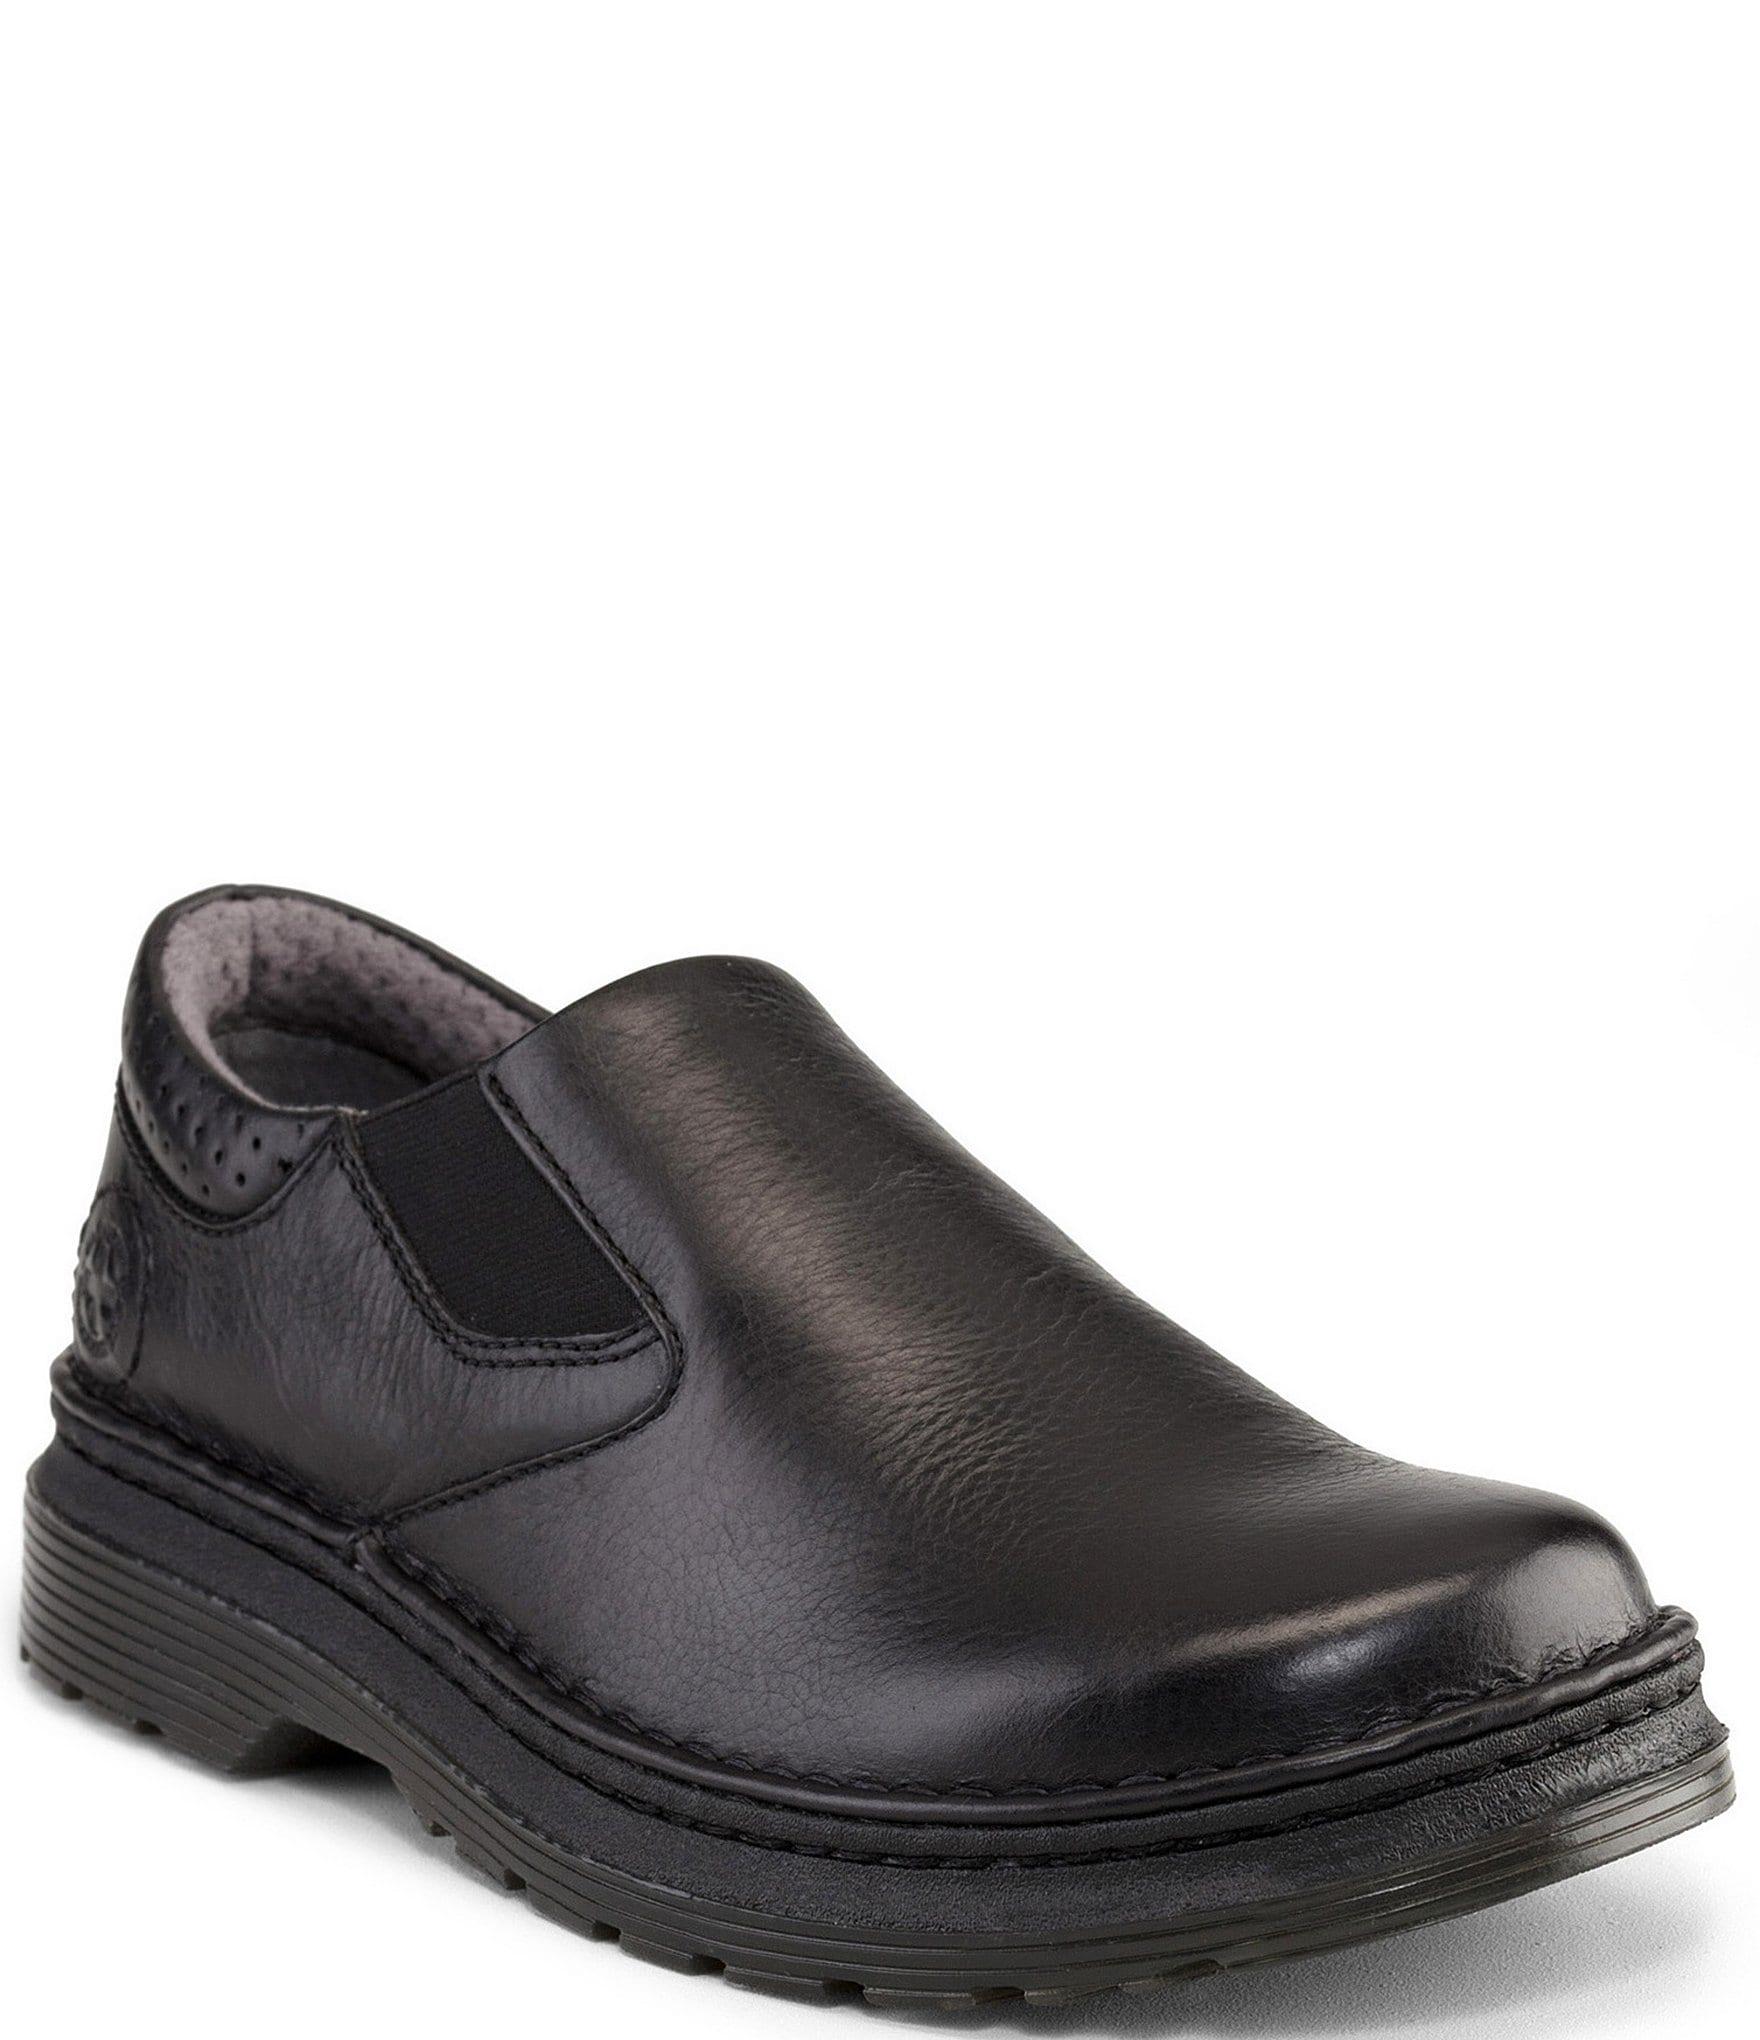 Dr. Martens Men's Orson Casual Loafers